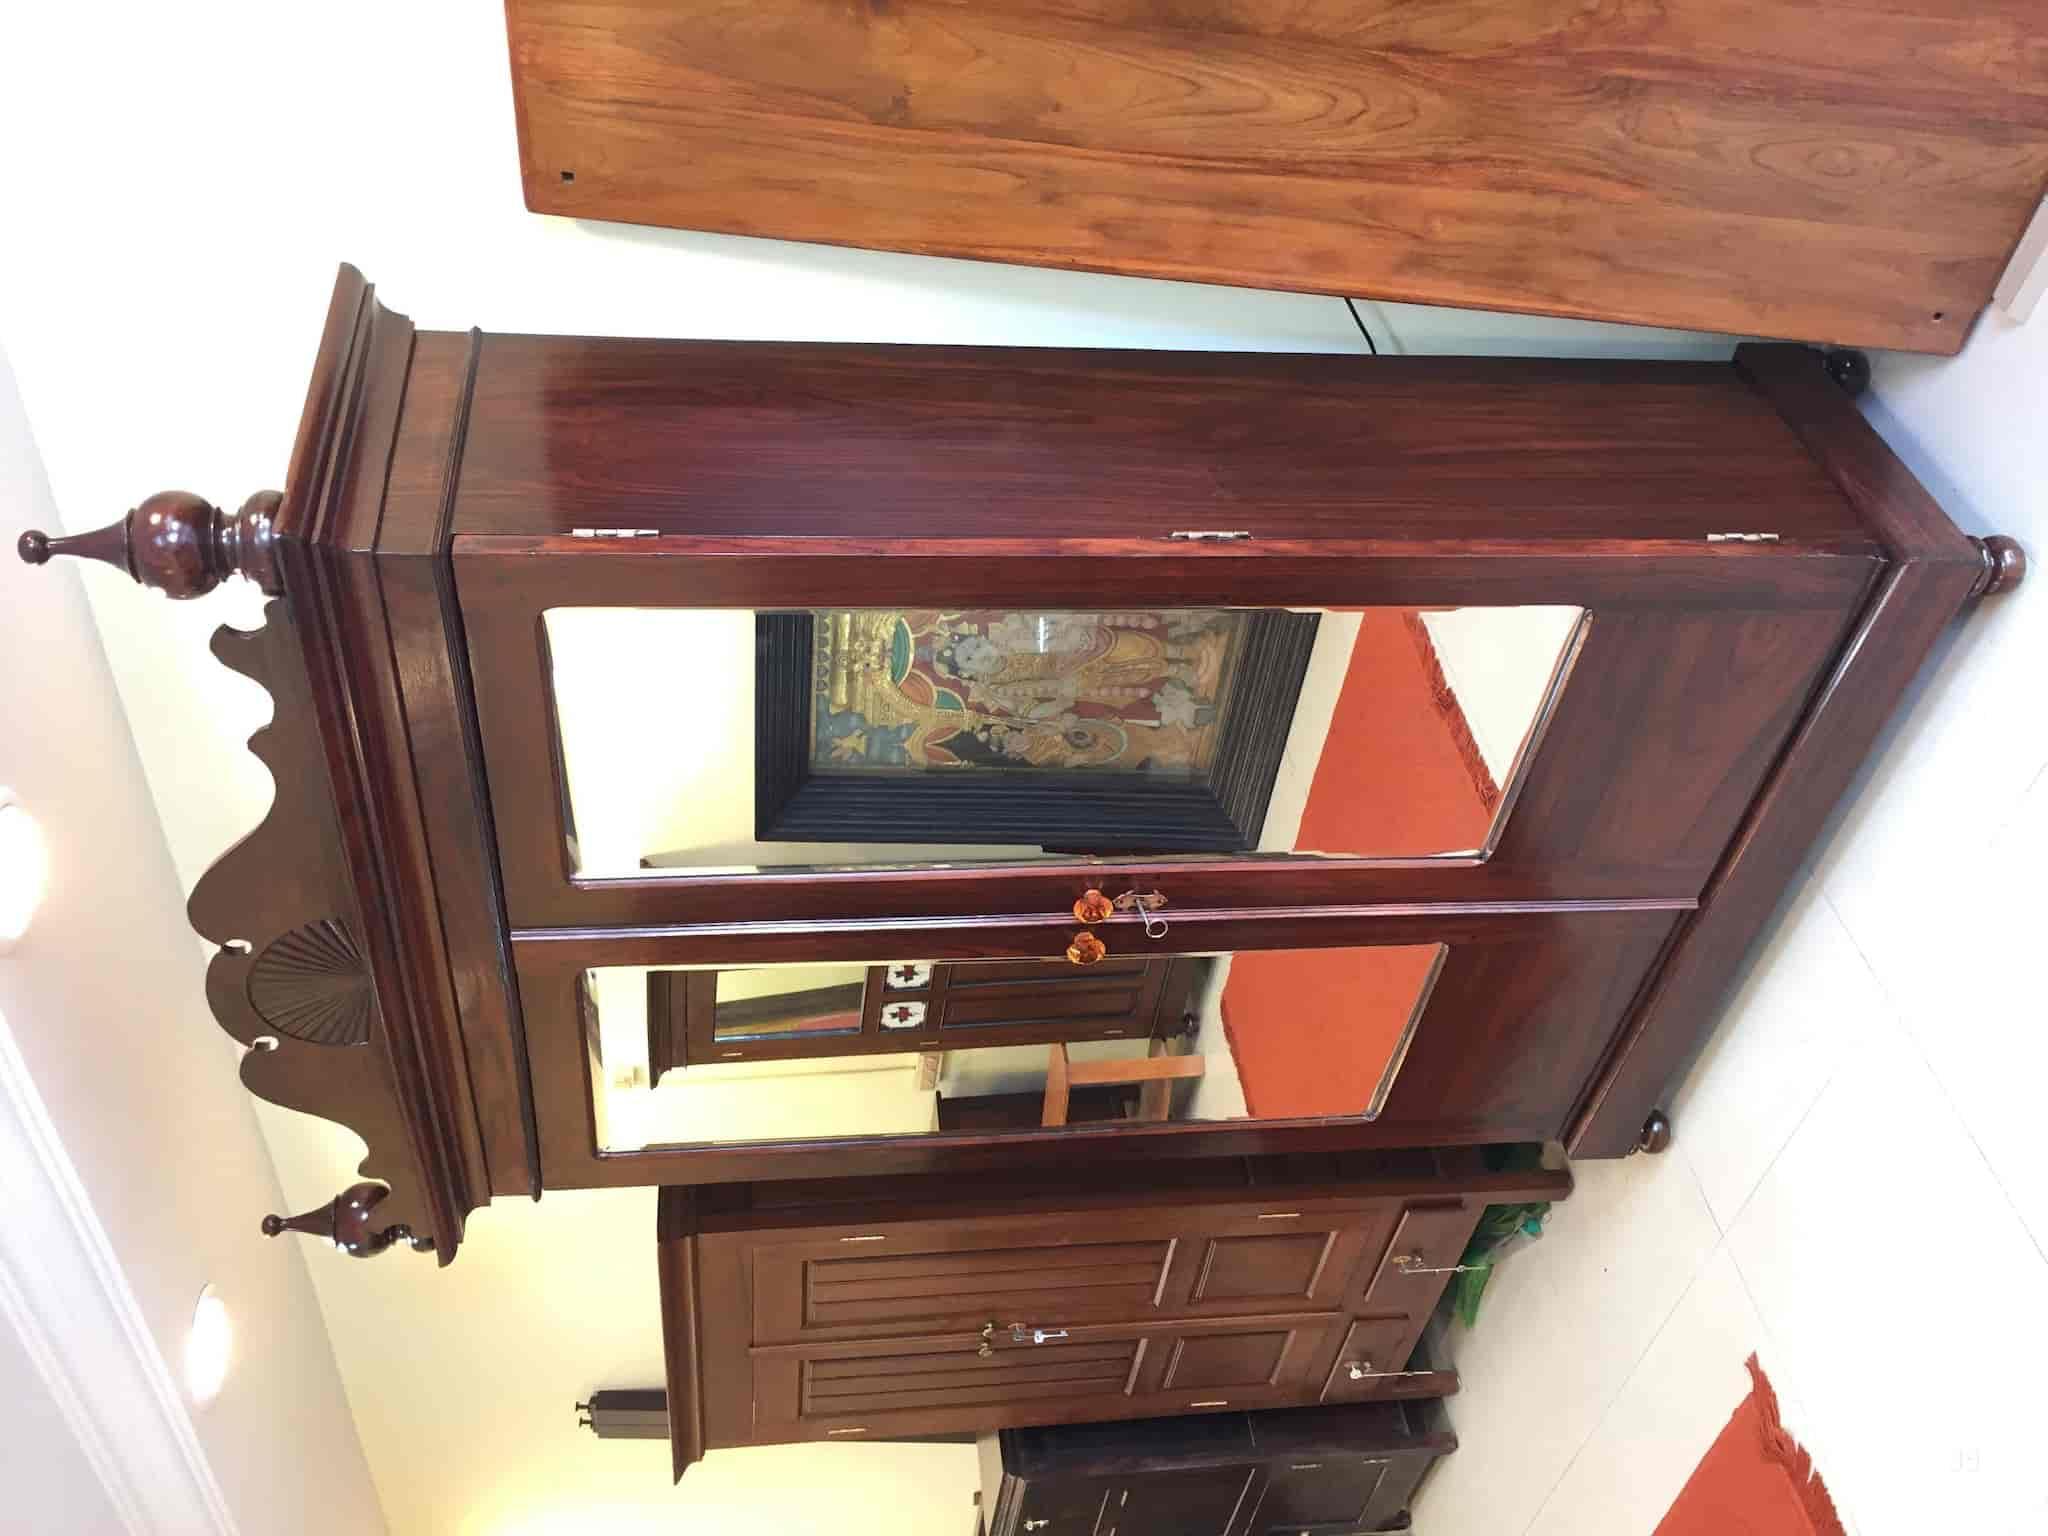 Antique Furniture Shop, Ramanathapuram Coimbatore   Antique Furniture  Dealers In Coimbatore   Justdial